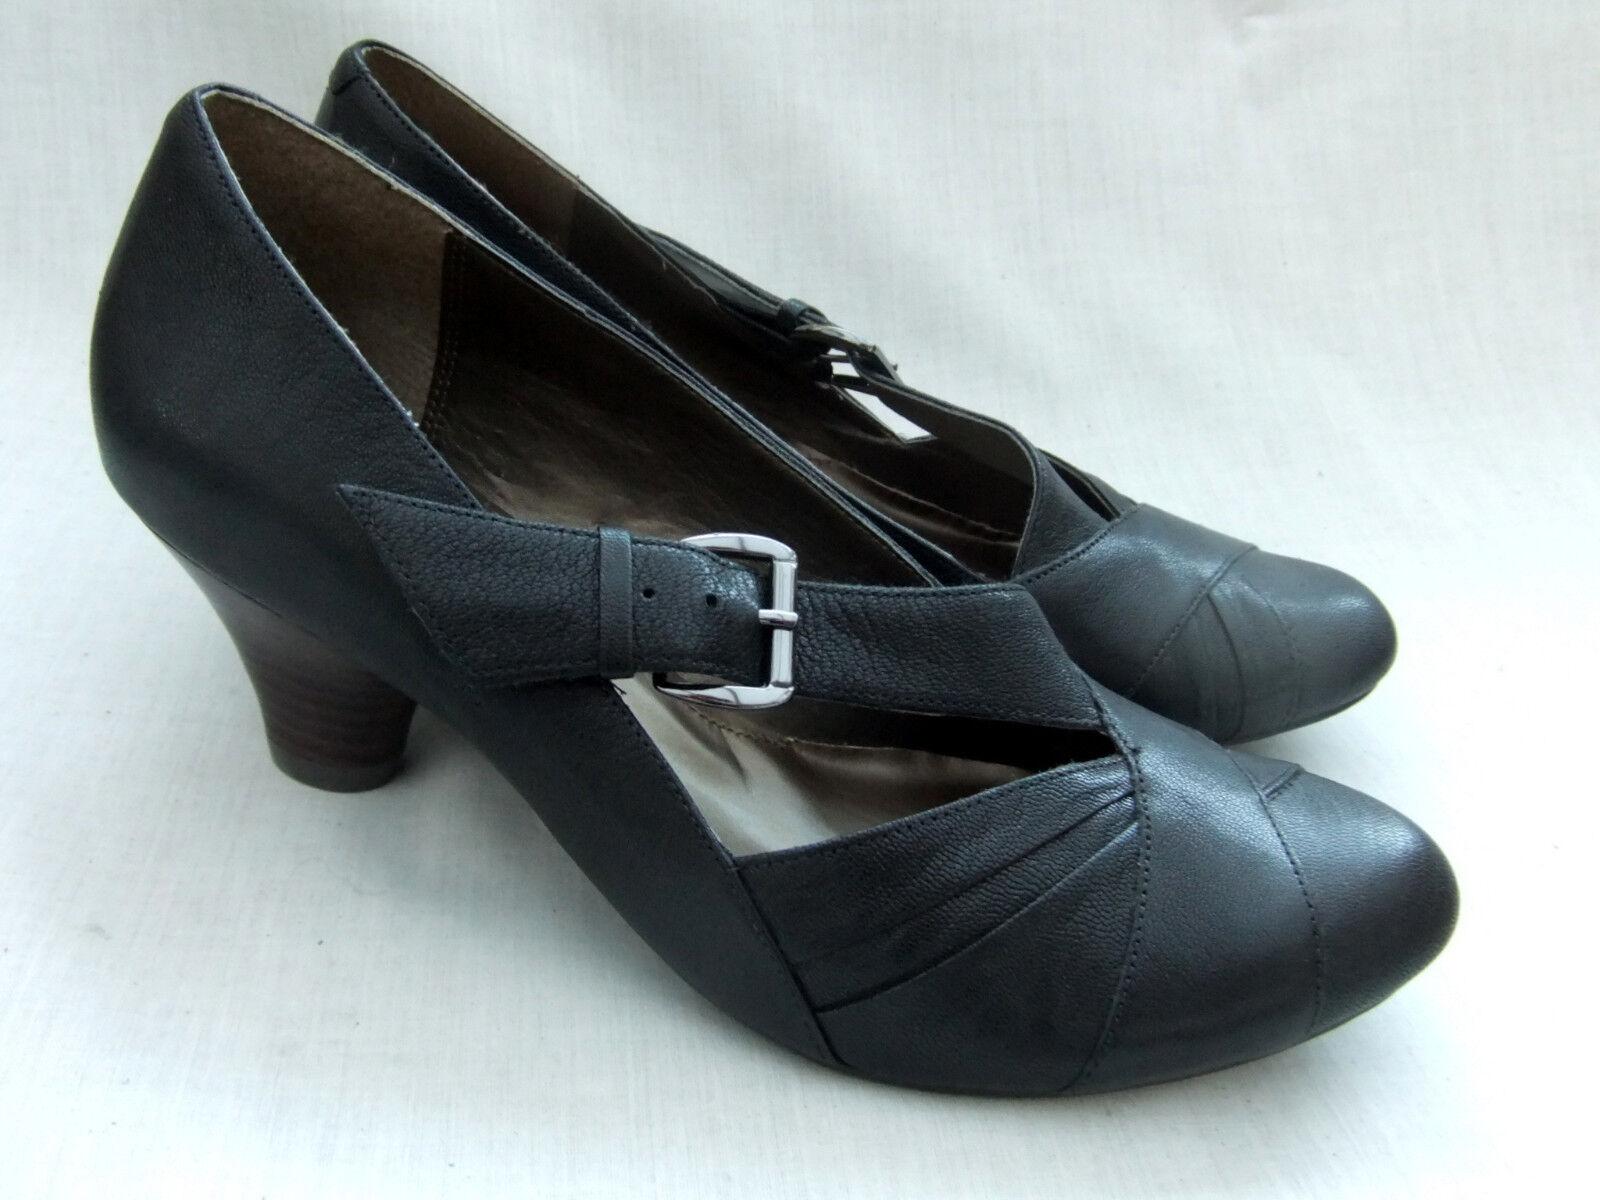 NEW CLARKS SOFTWEAR DAPPLE gris femmes noir LEATHER chaussures Taille 7.5   41.5